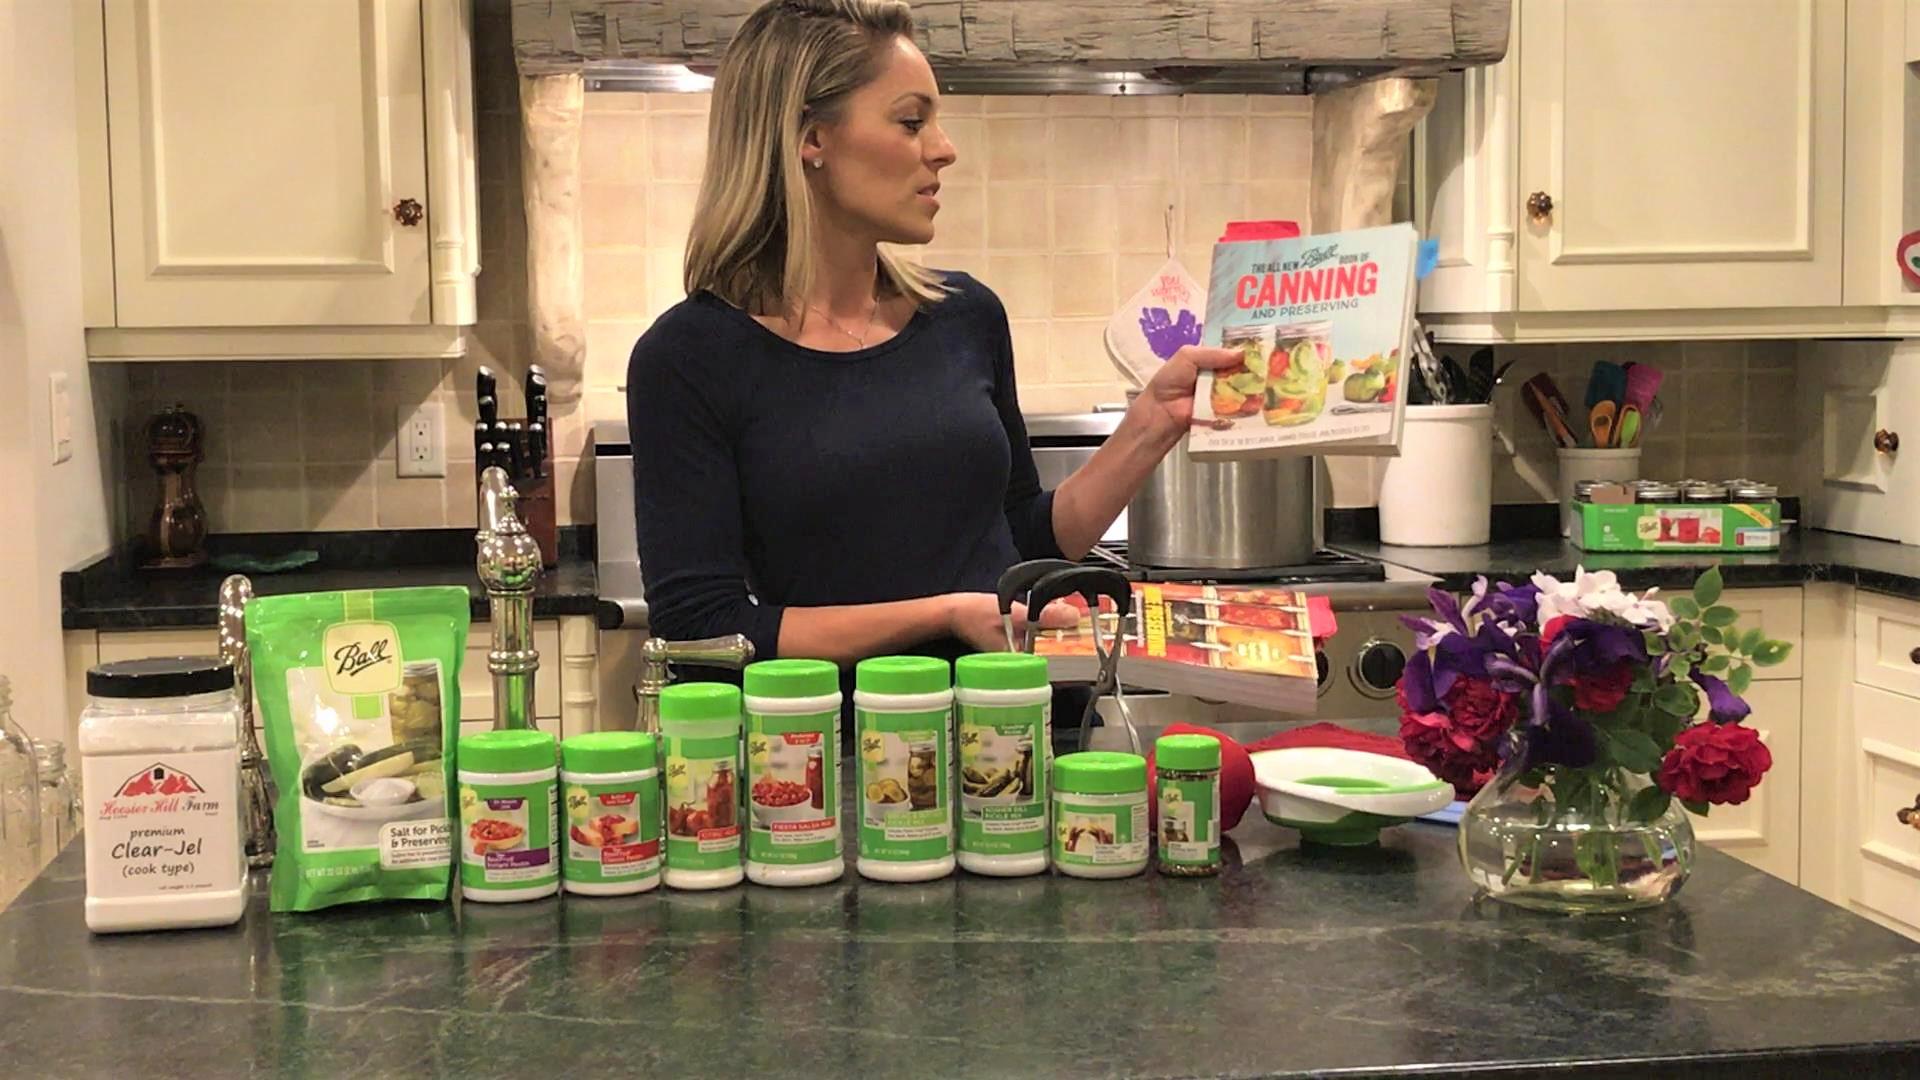 Canning 101 Video: The Basics